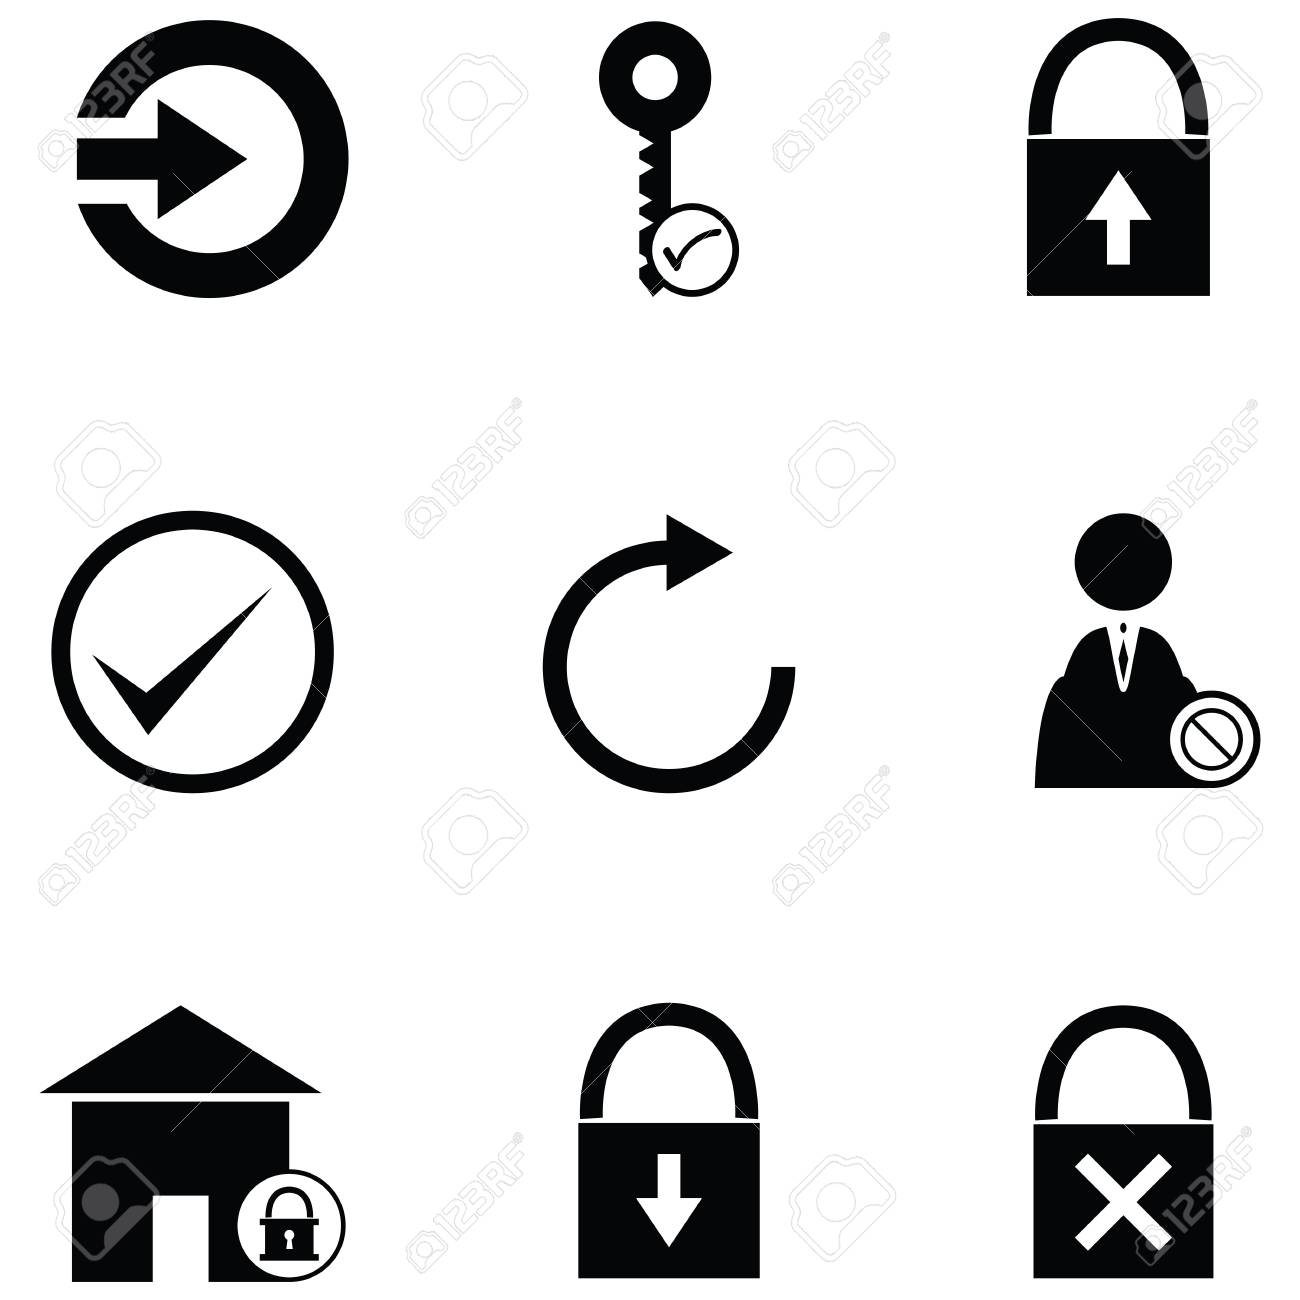 Login icon set on white background vector illustration